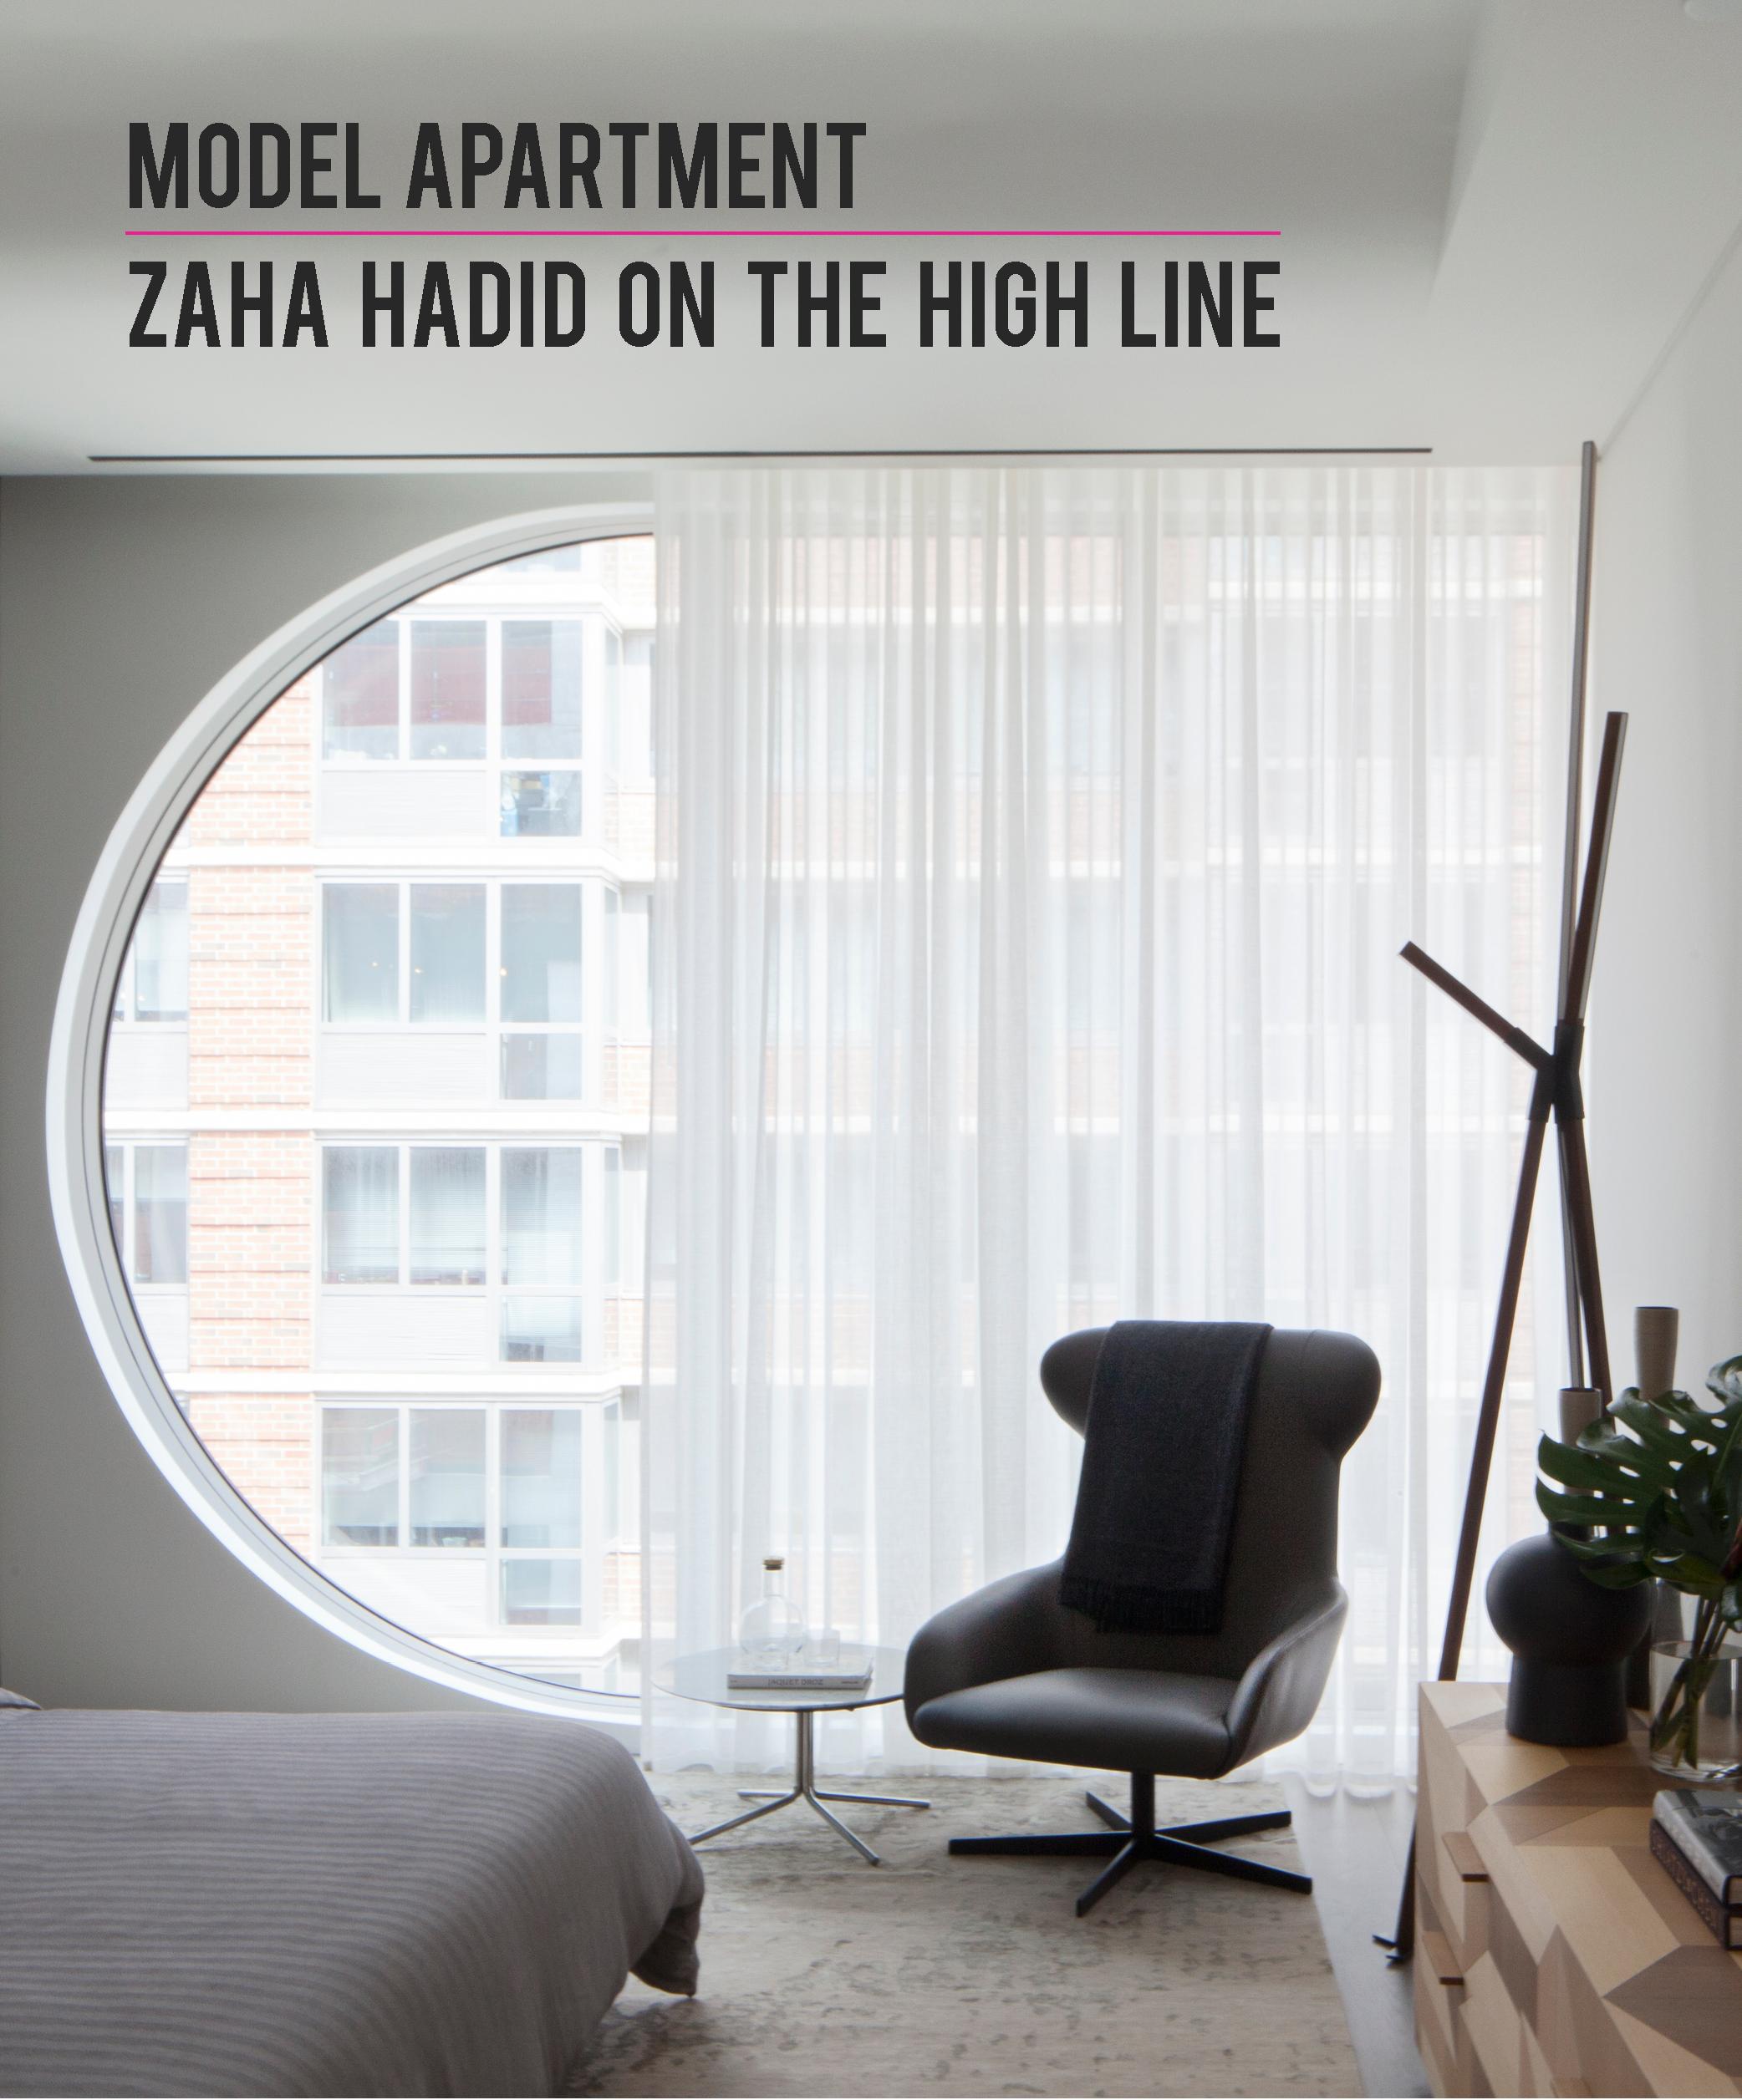 press_zaha model apartment.jpg